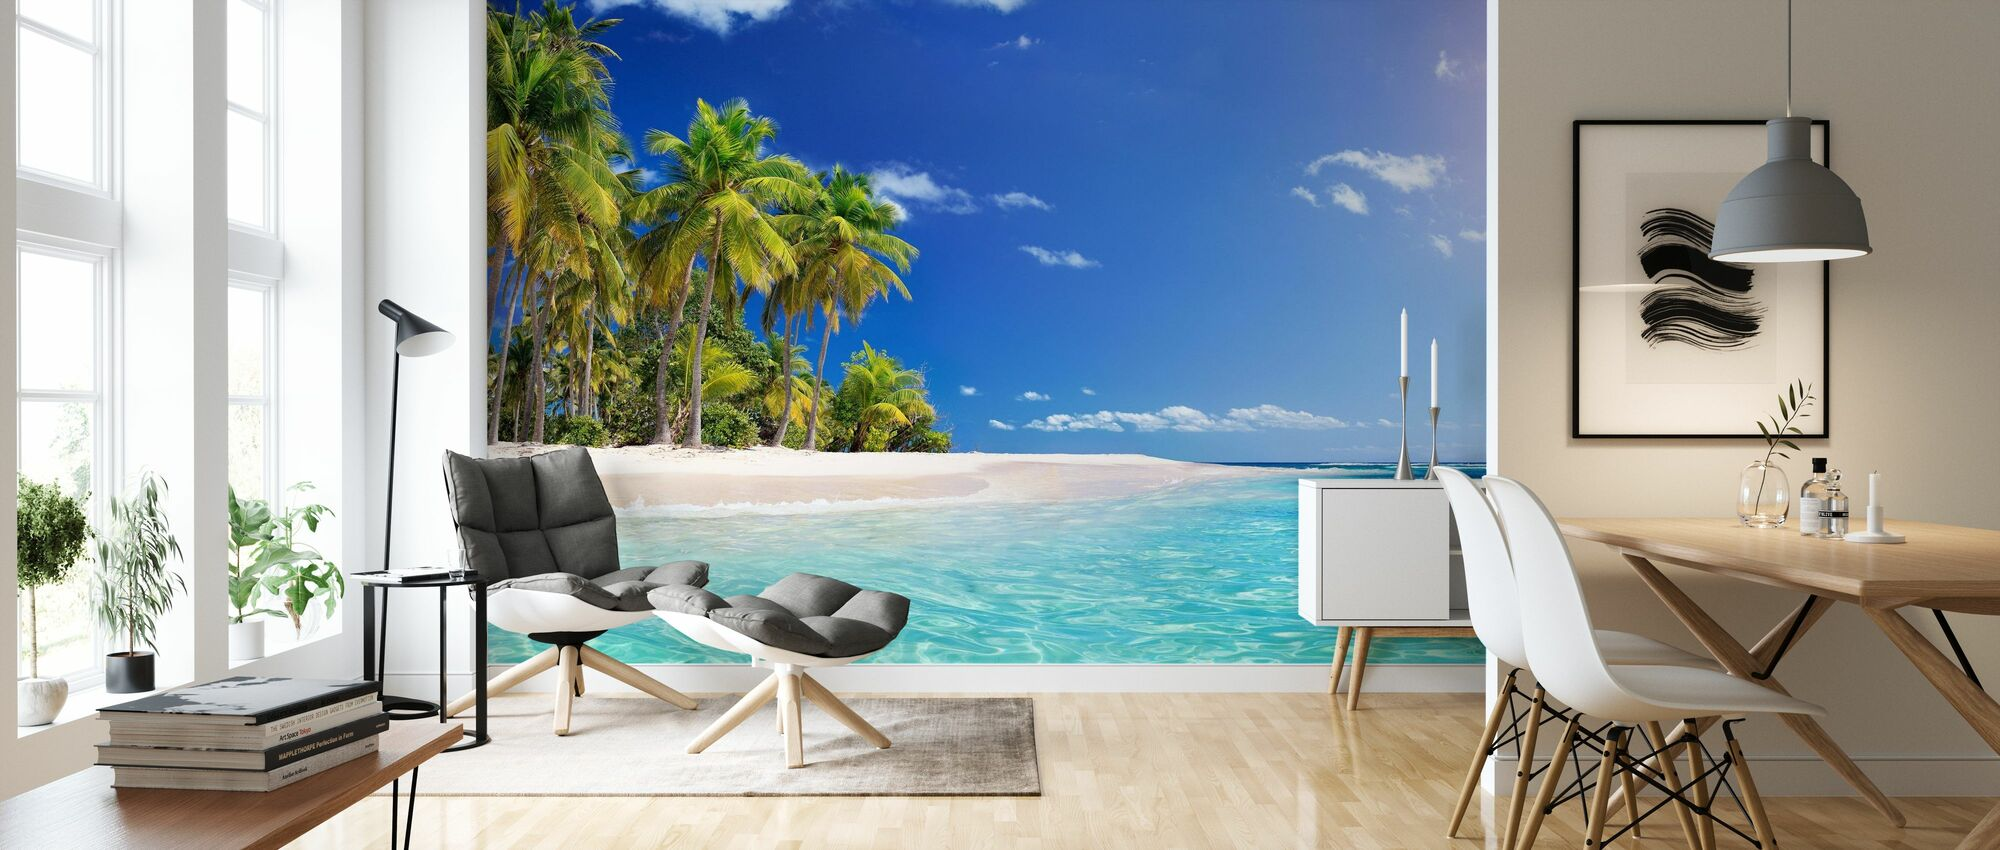 Palm Tree Beach - Wallpaper - Living Room